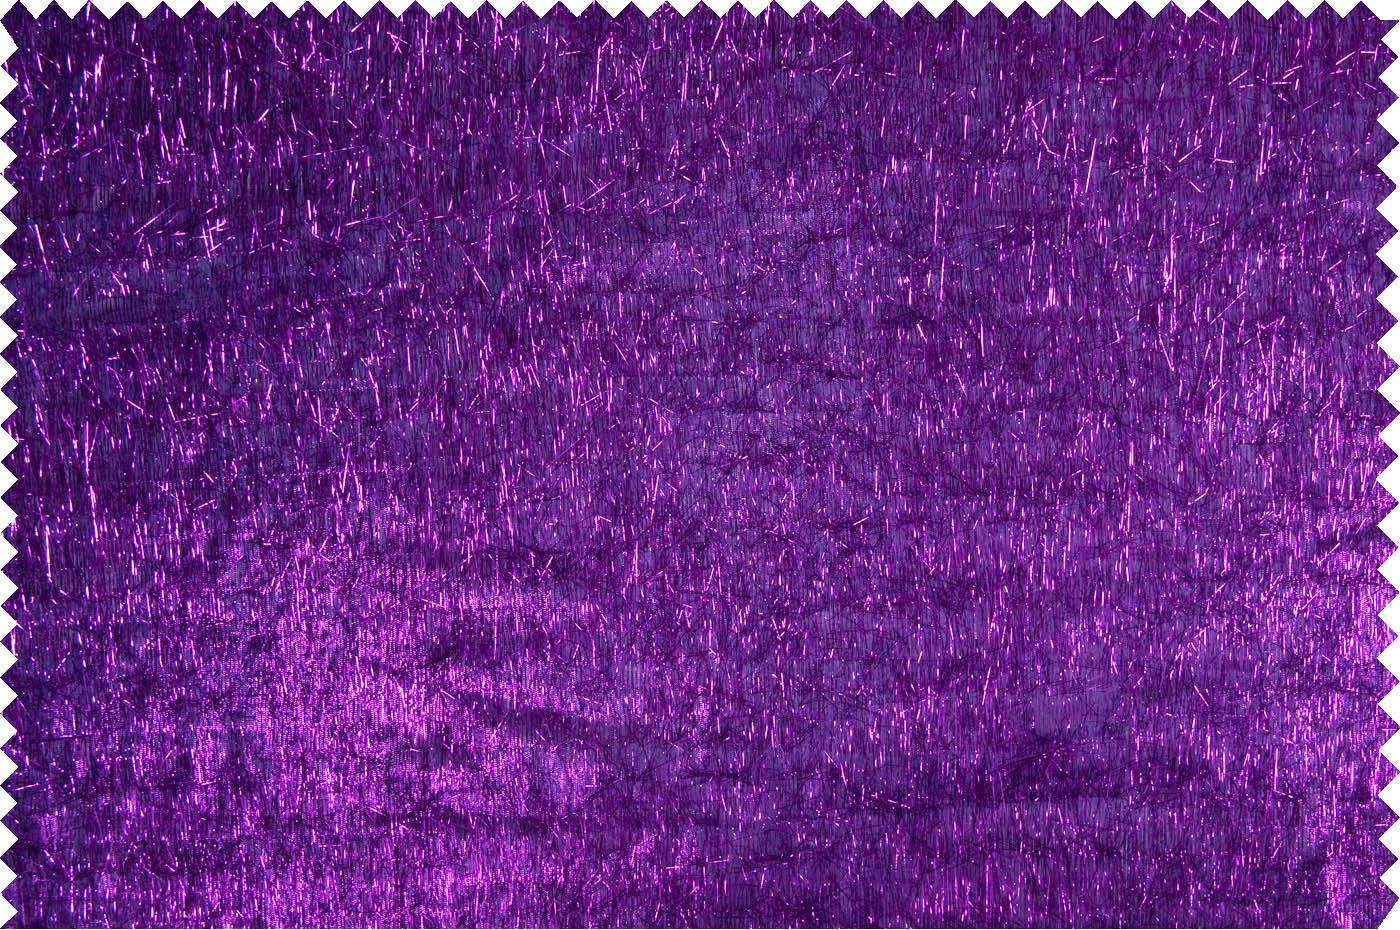 Lavender Background - WallpaperSafari